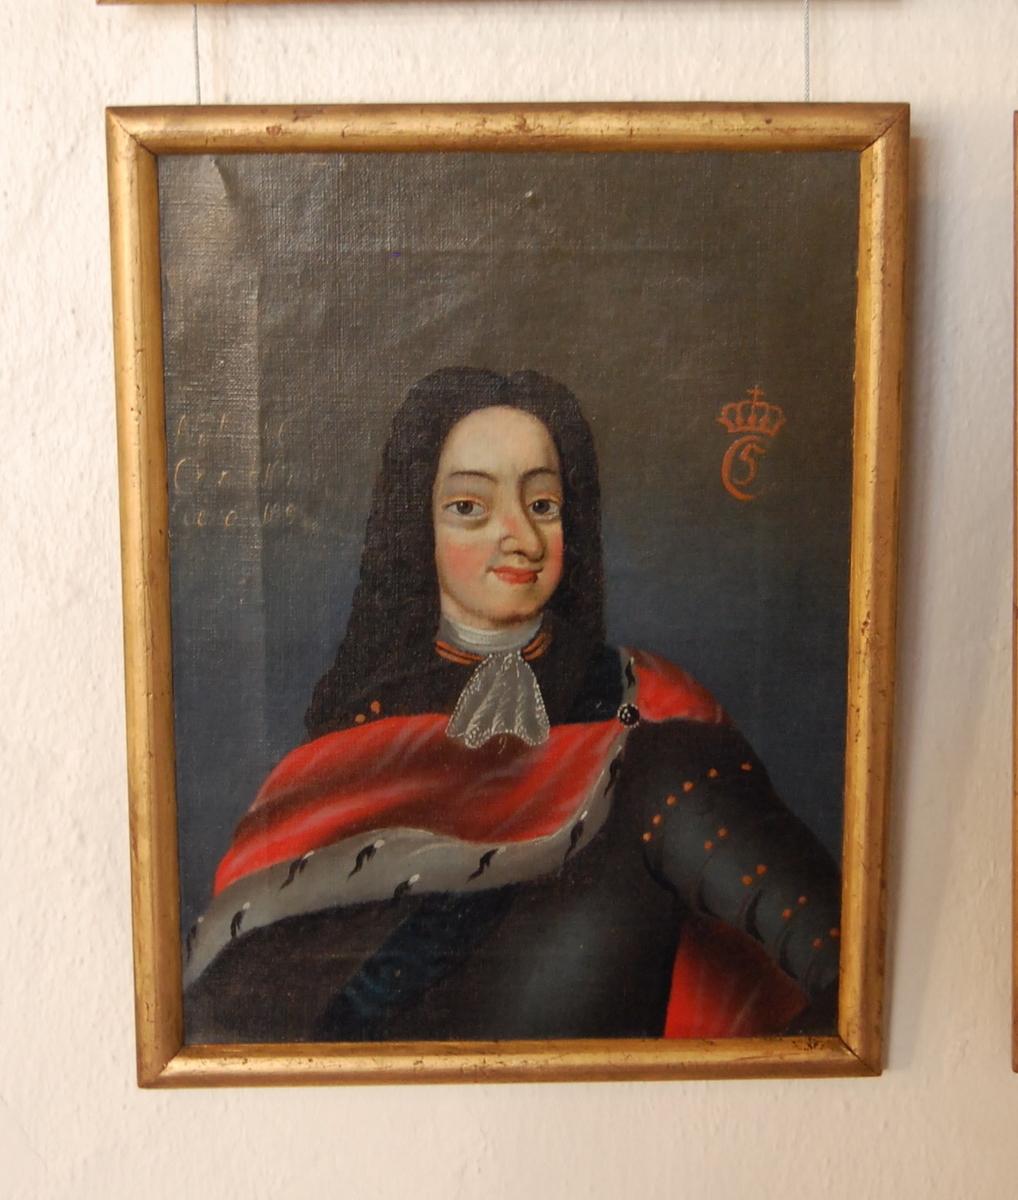 Portrett av Christian V. Olje på lerret. Halvfigur en face, hodet i halv profil mot høyre. Blågrå rustning, rød kappe.